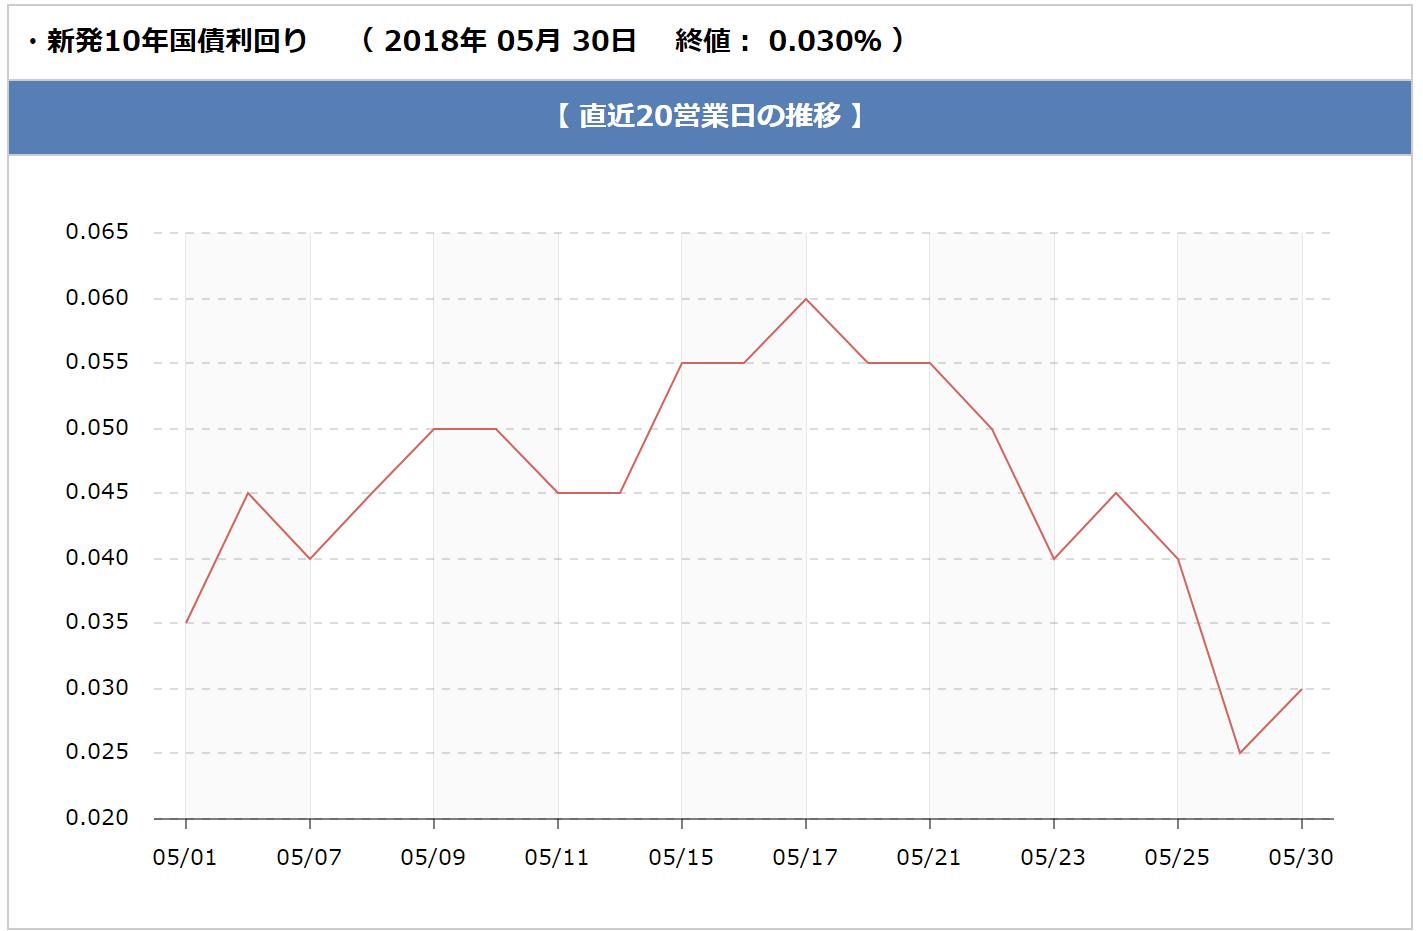 長期金利の推移(2018年5月)